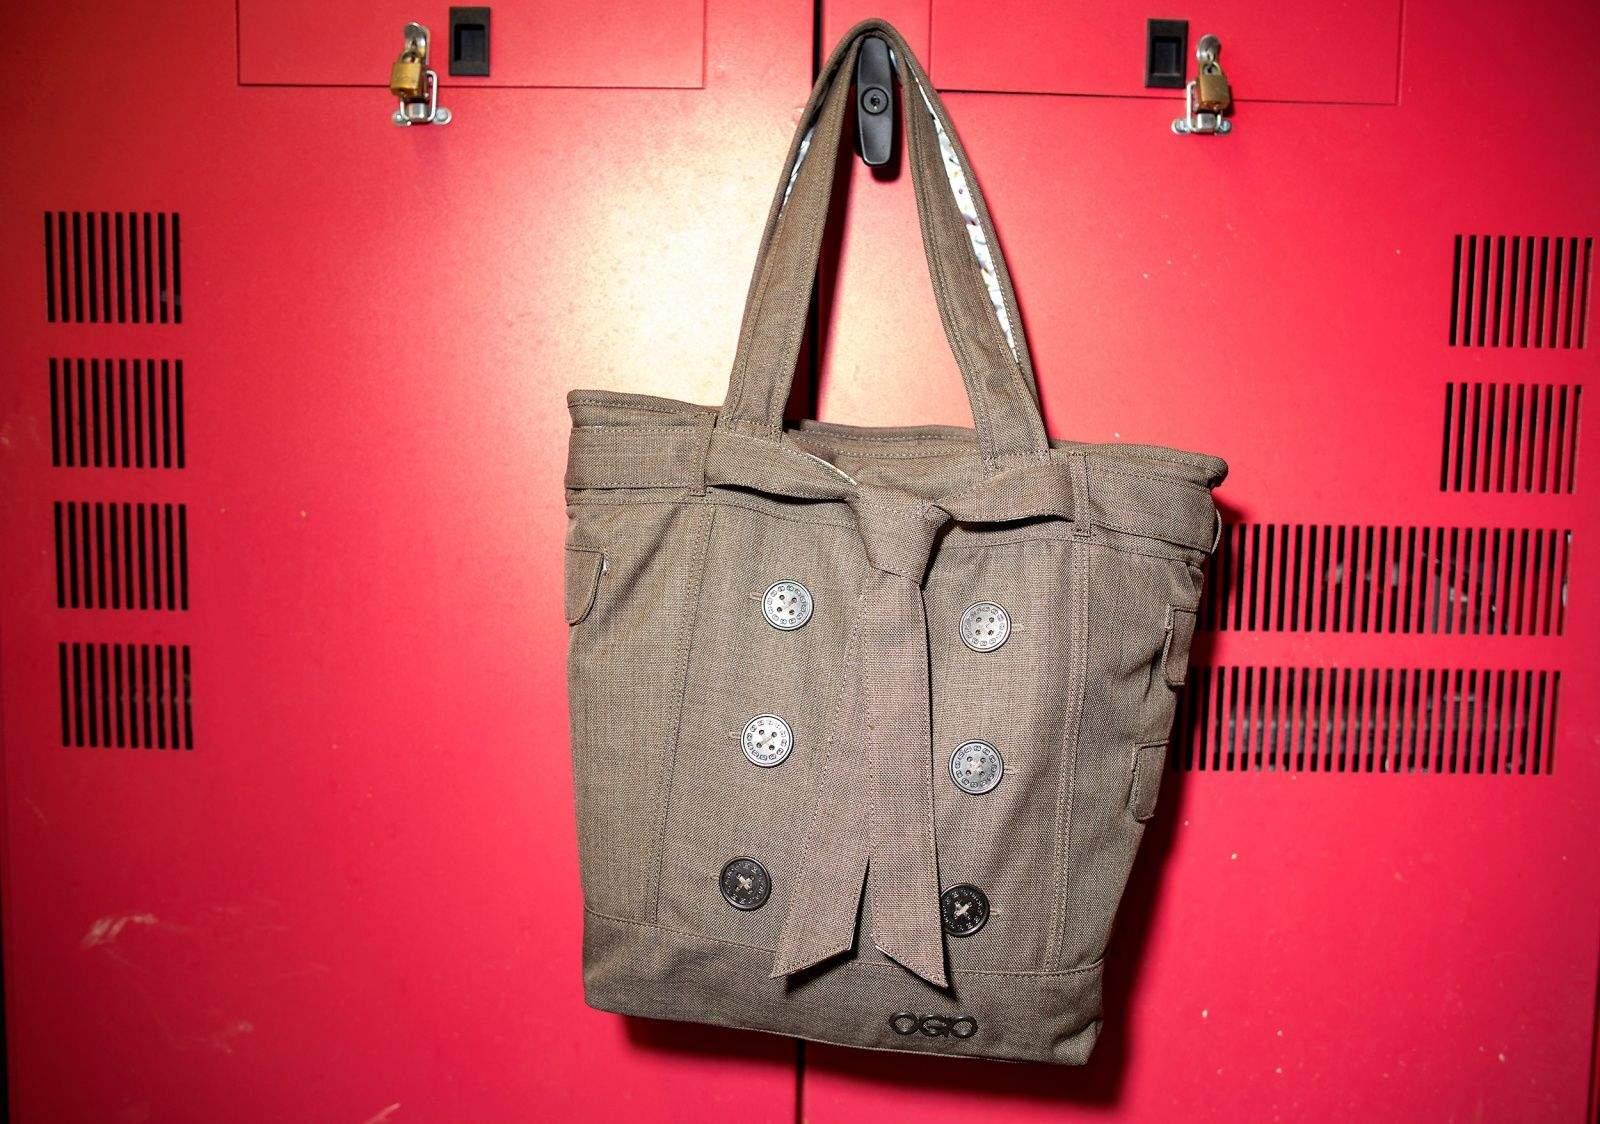 Ogio Hampton bag. Photo: Jim Merithew/Cult of Mac